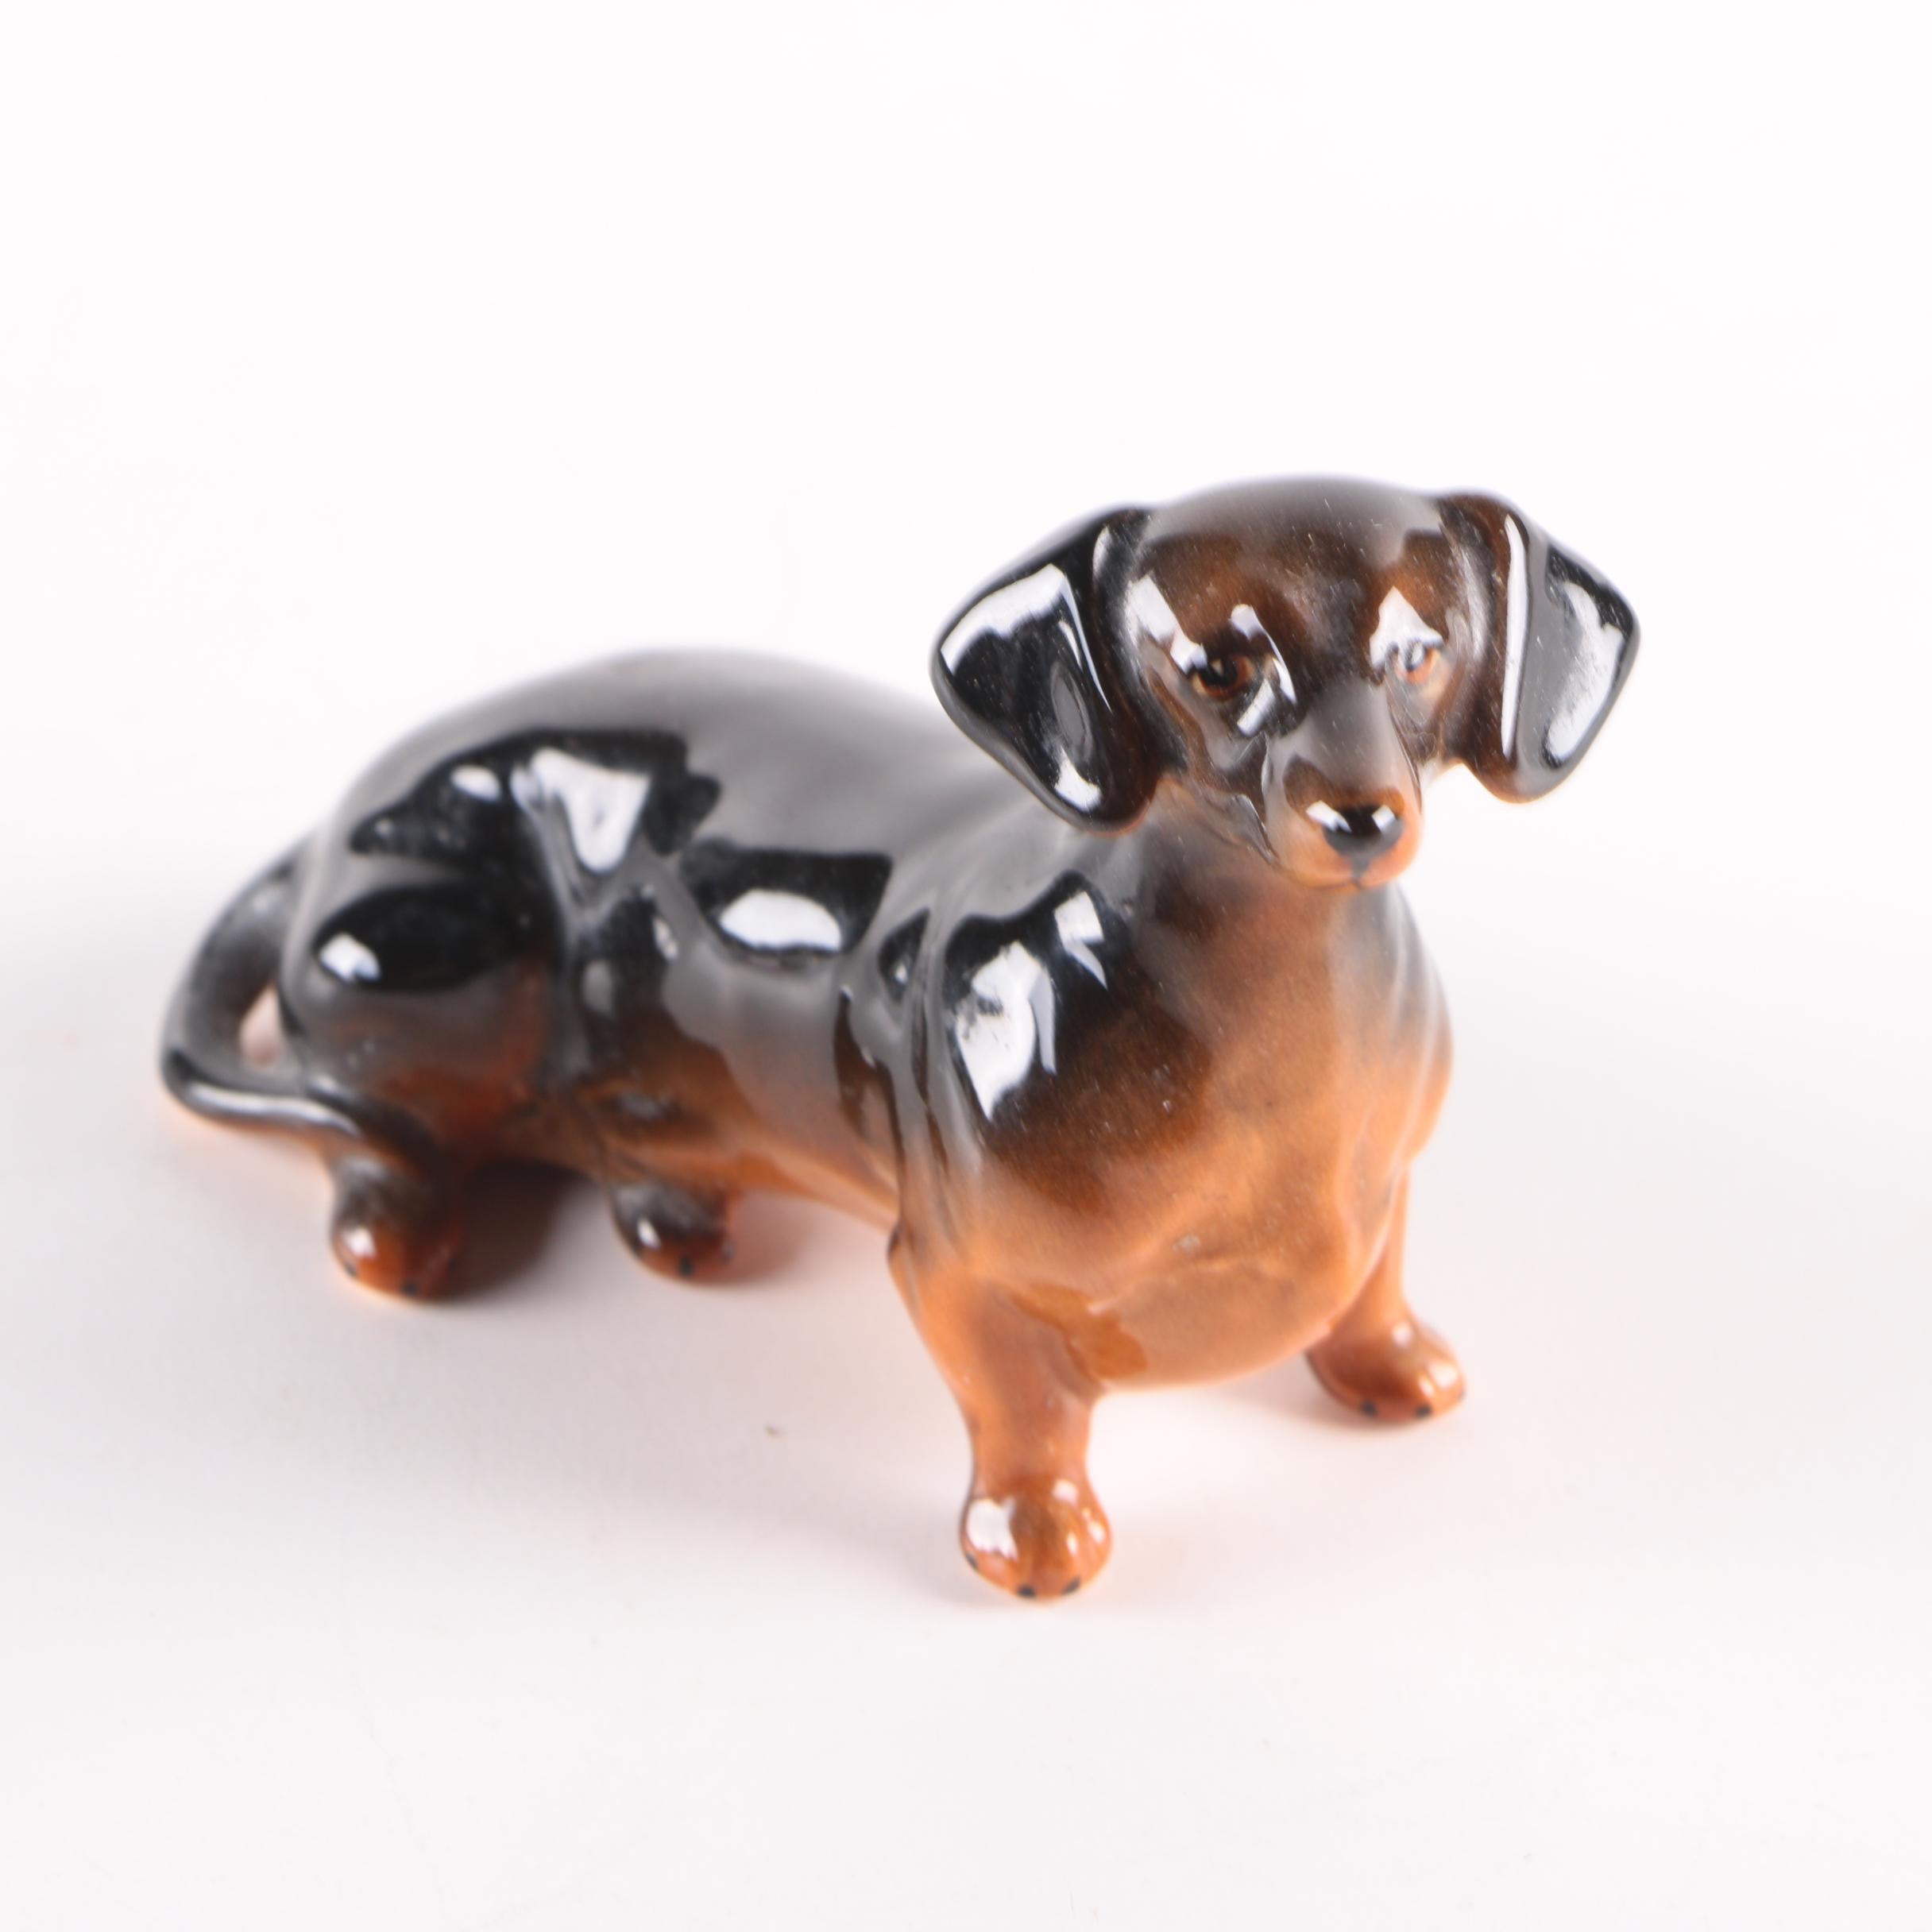 Vintage Beswick Ceramic Dachshund Figurine